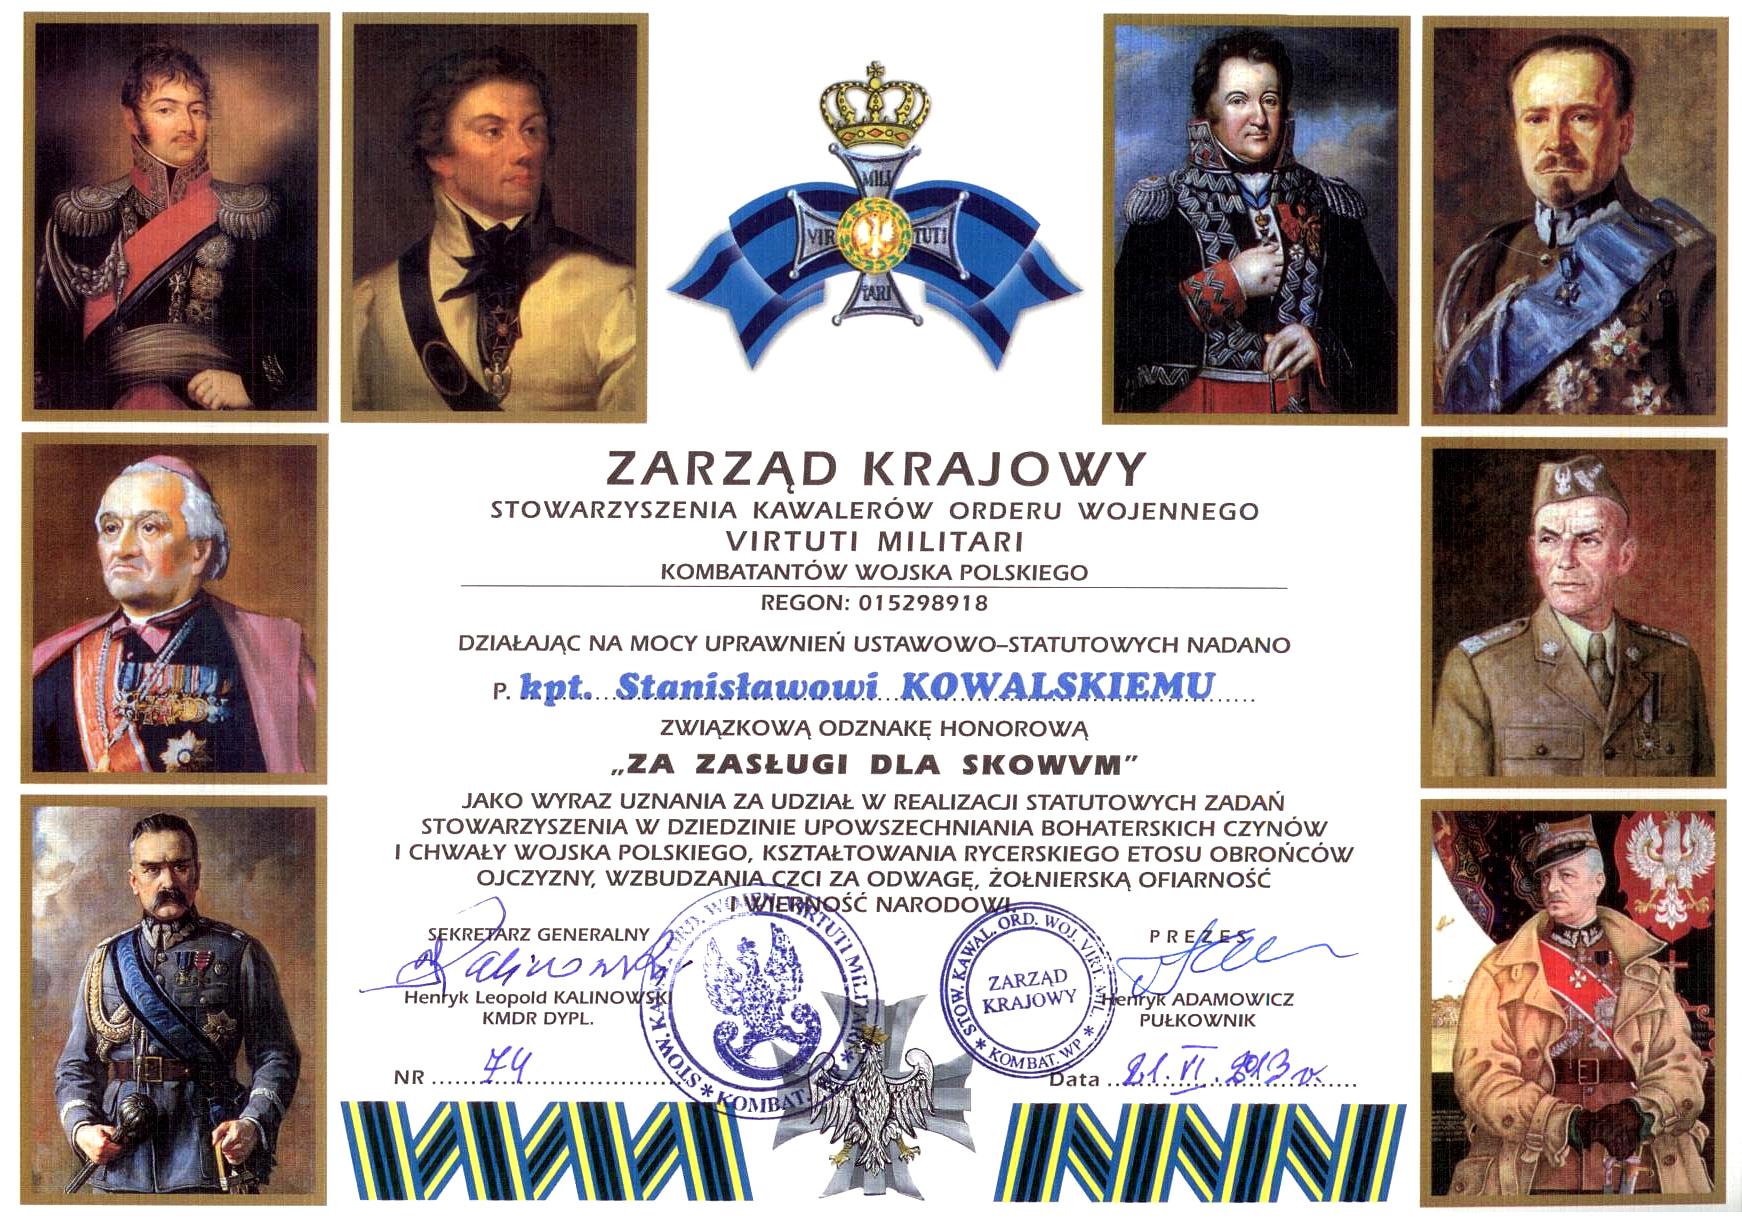 Związkowa Odznaka Honorowa